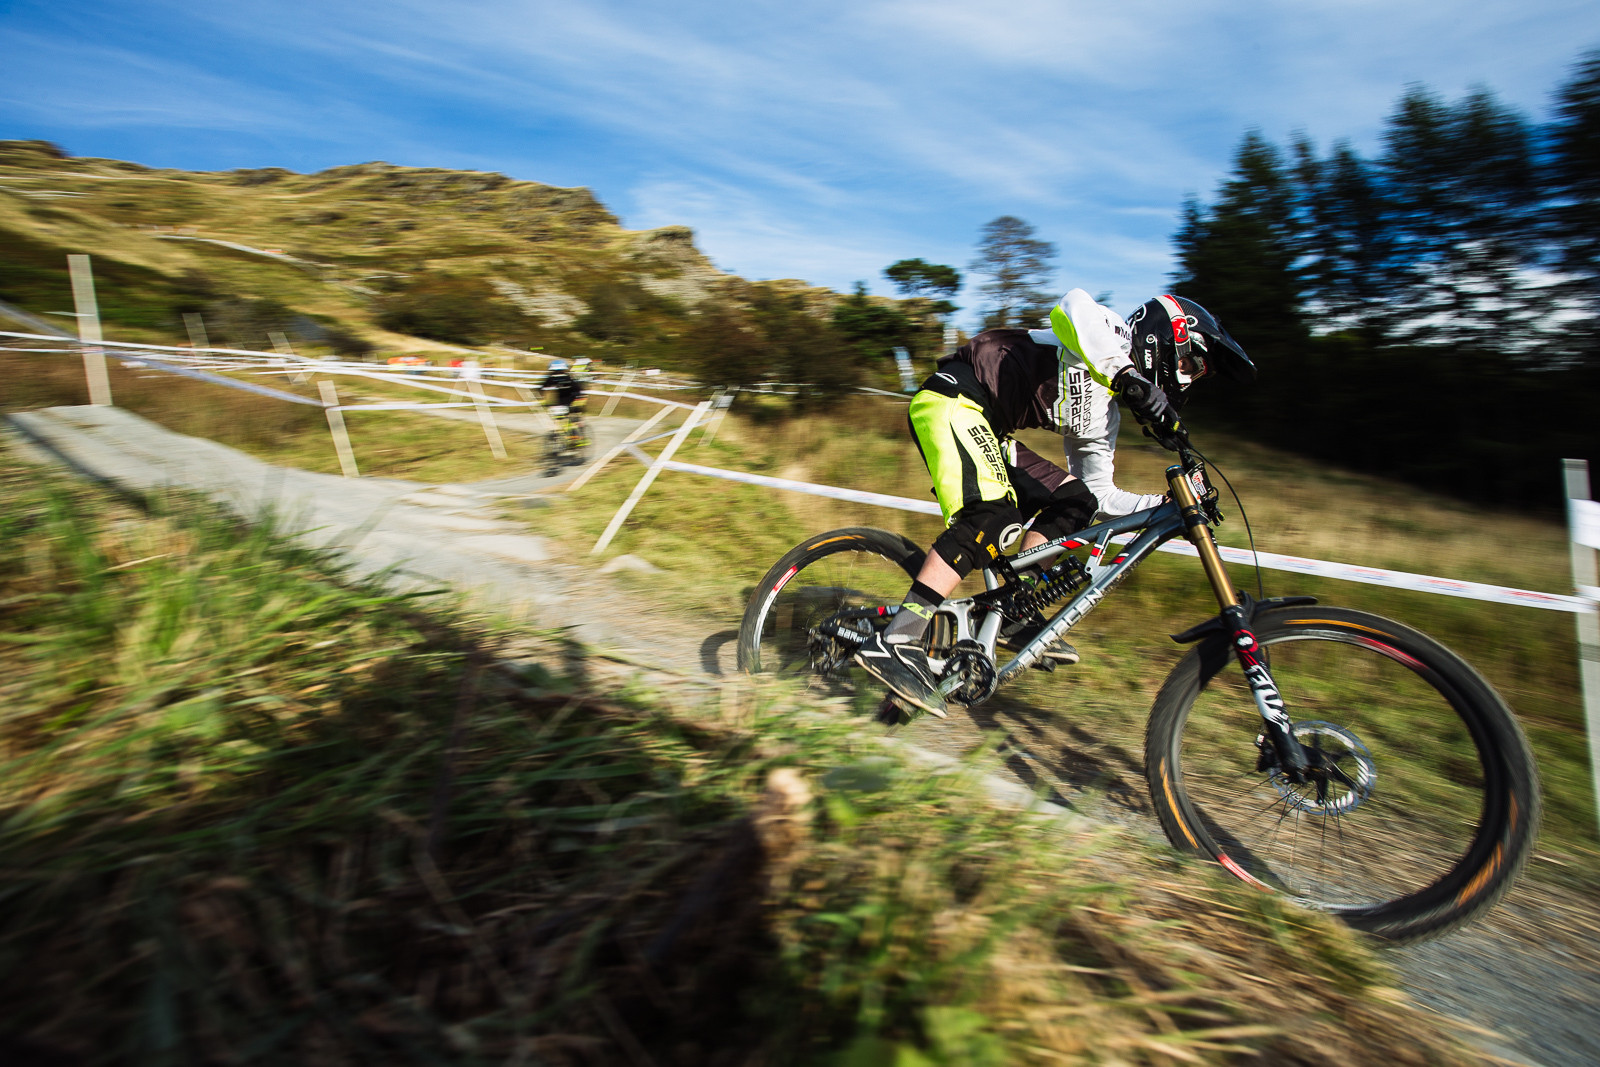 Matt Walker, Youth Winner, 2015 British Downhill Series Finals, Antur Stiniog - 2015 British Downhill Series Finals - Mountain Biking Pictures - Vital MTB